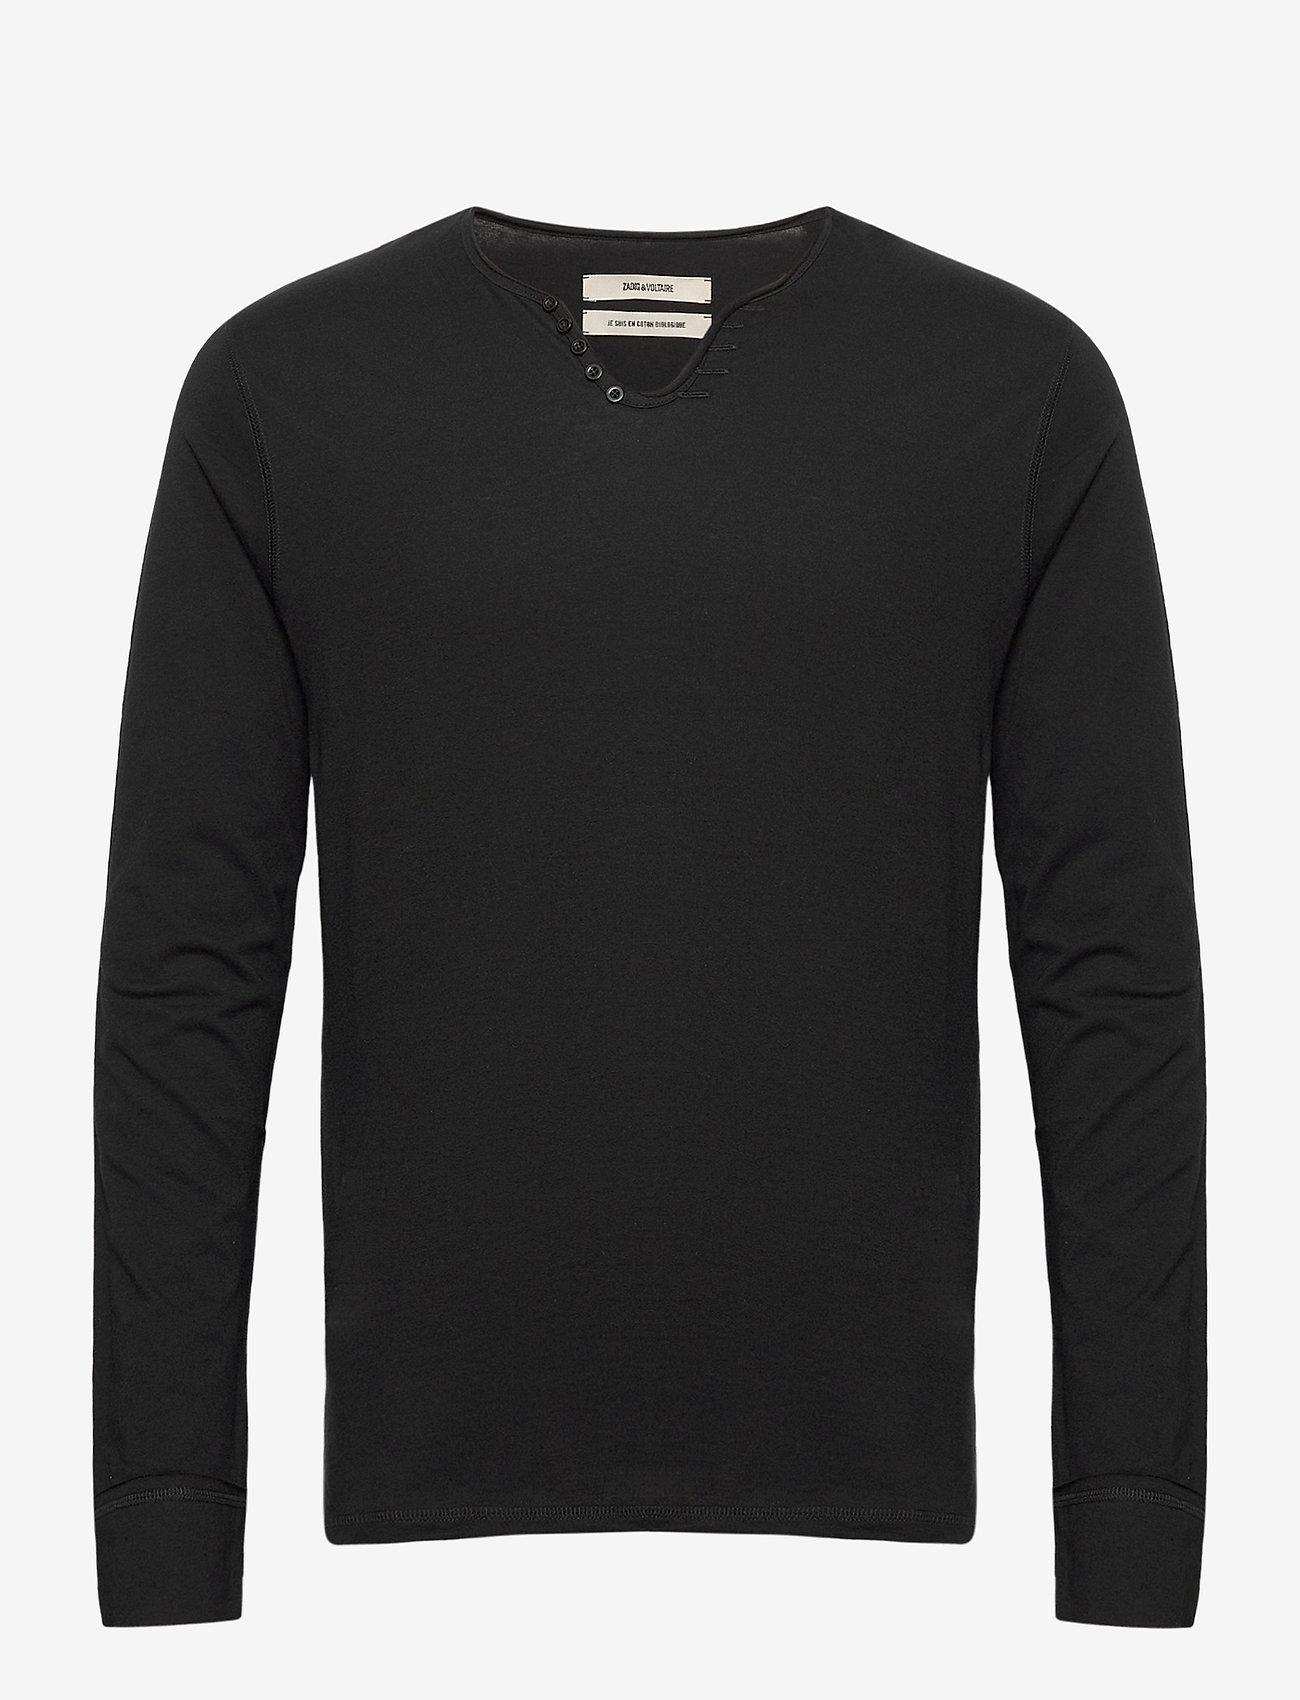 Zadig & Voltaire - MONASTIR ML ECO TUNISIEN ECOFRIENDLY - basic t-shirts - black - 0